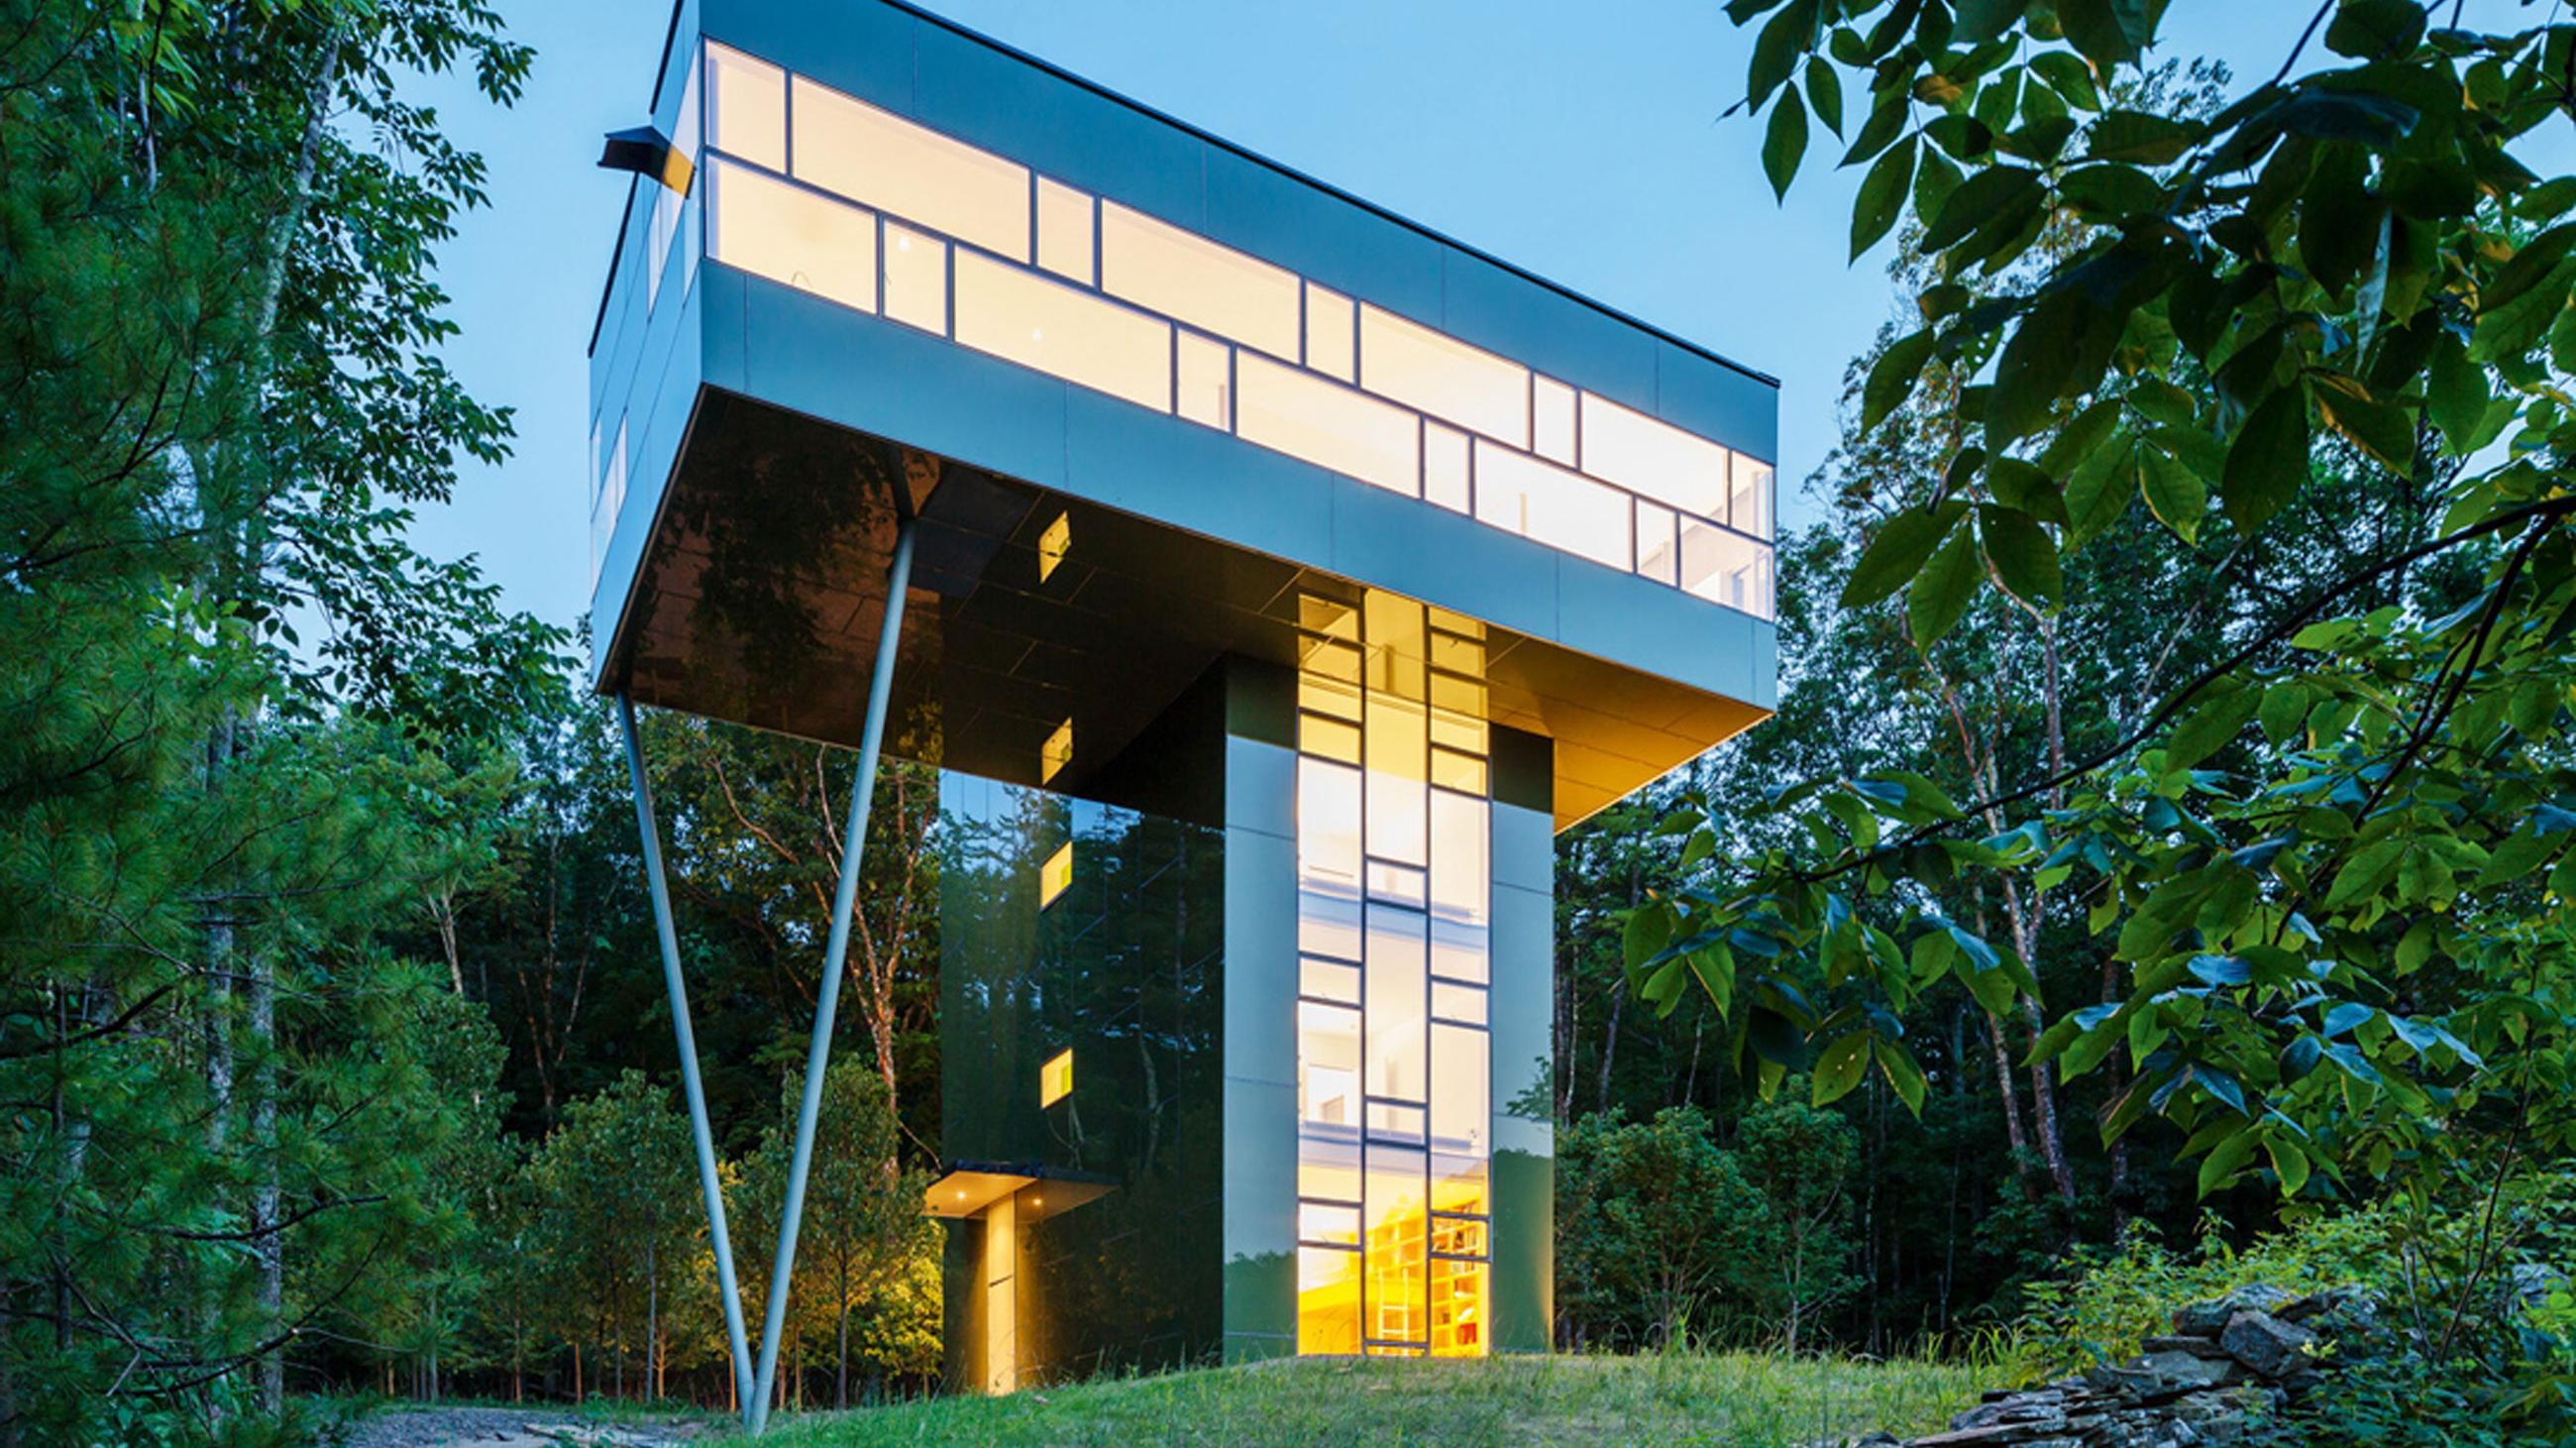 Building a self-portrait: inside architects' houses